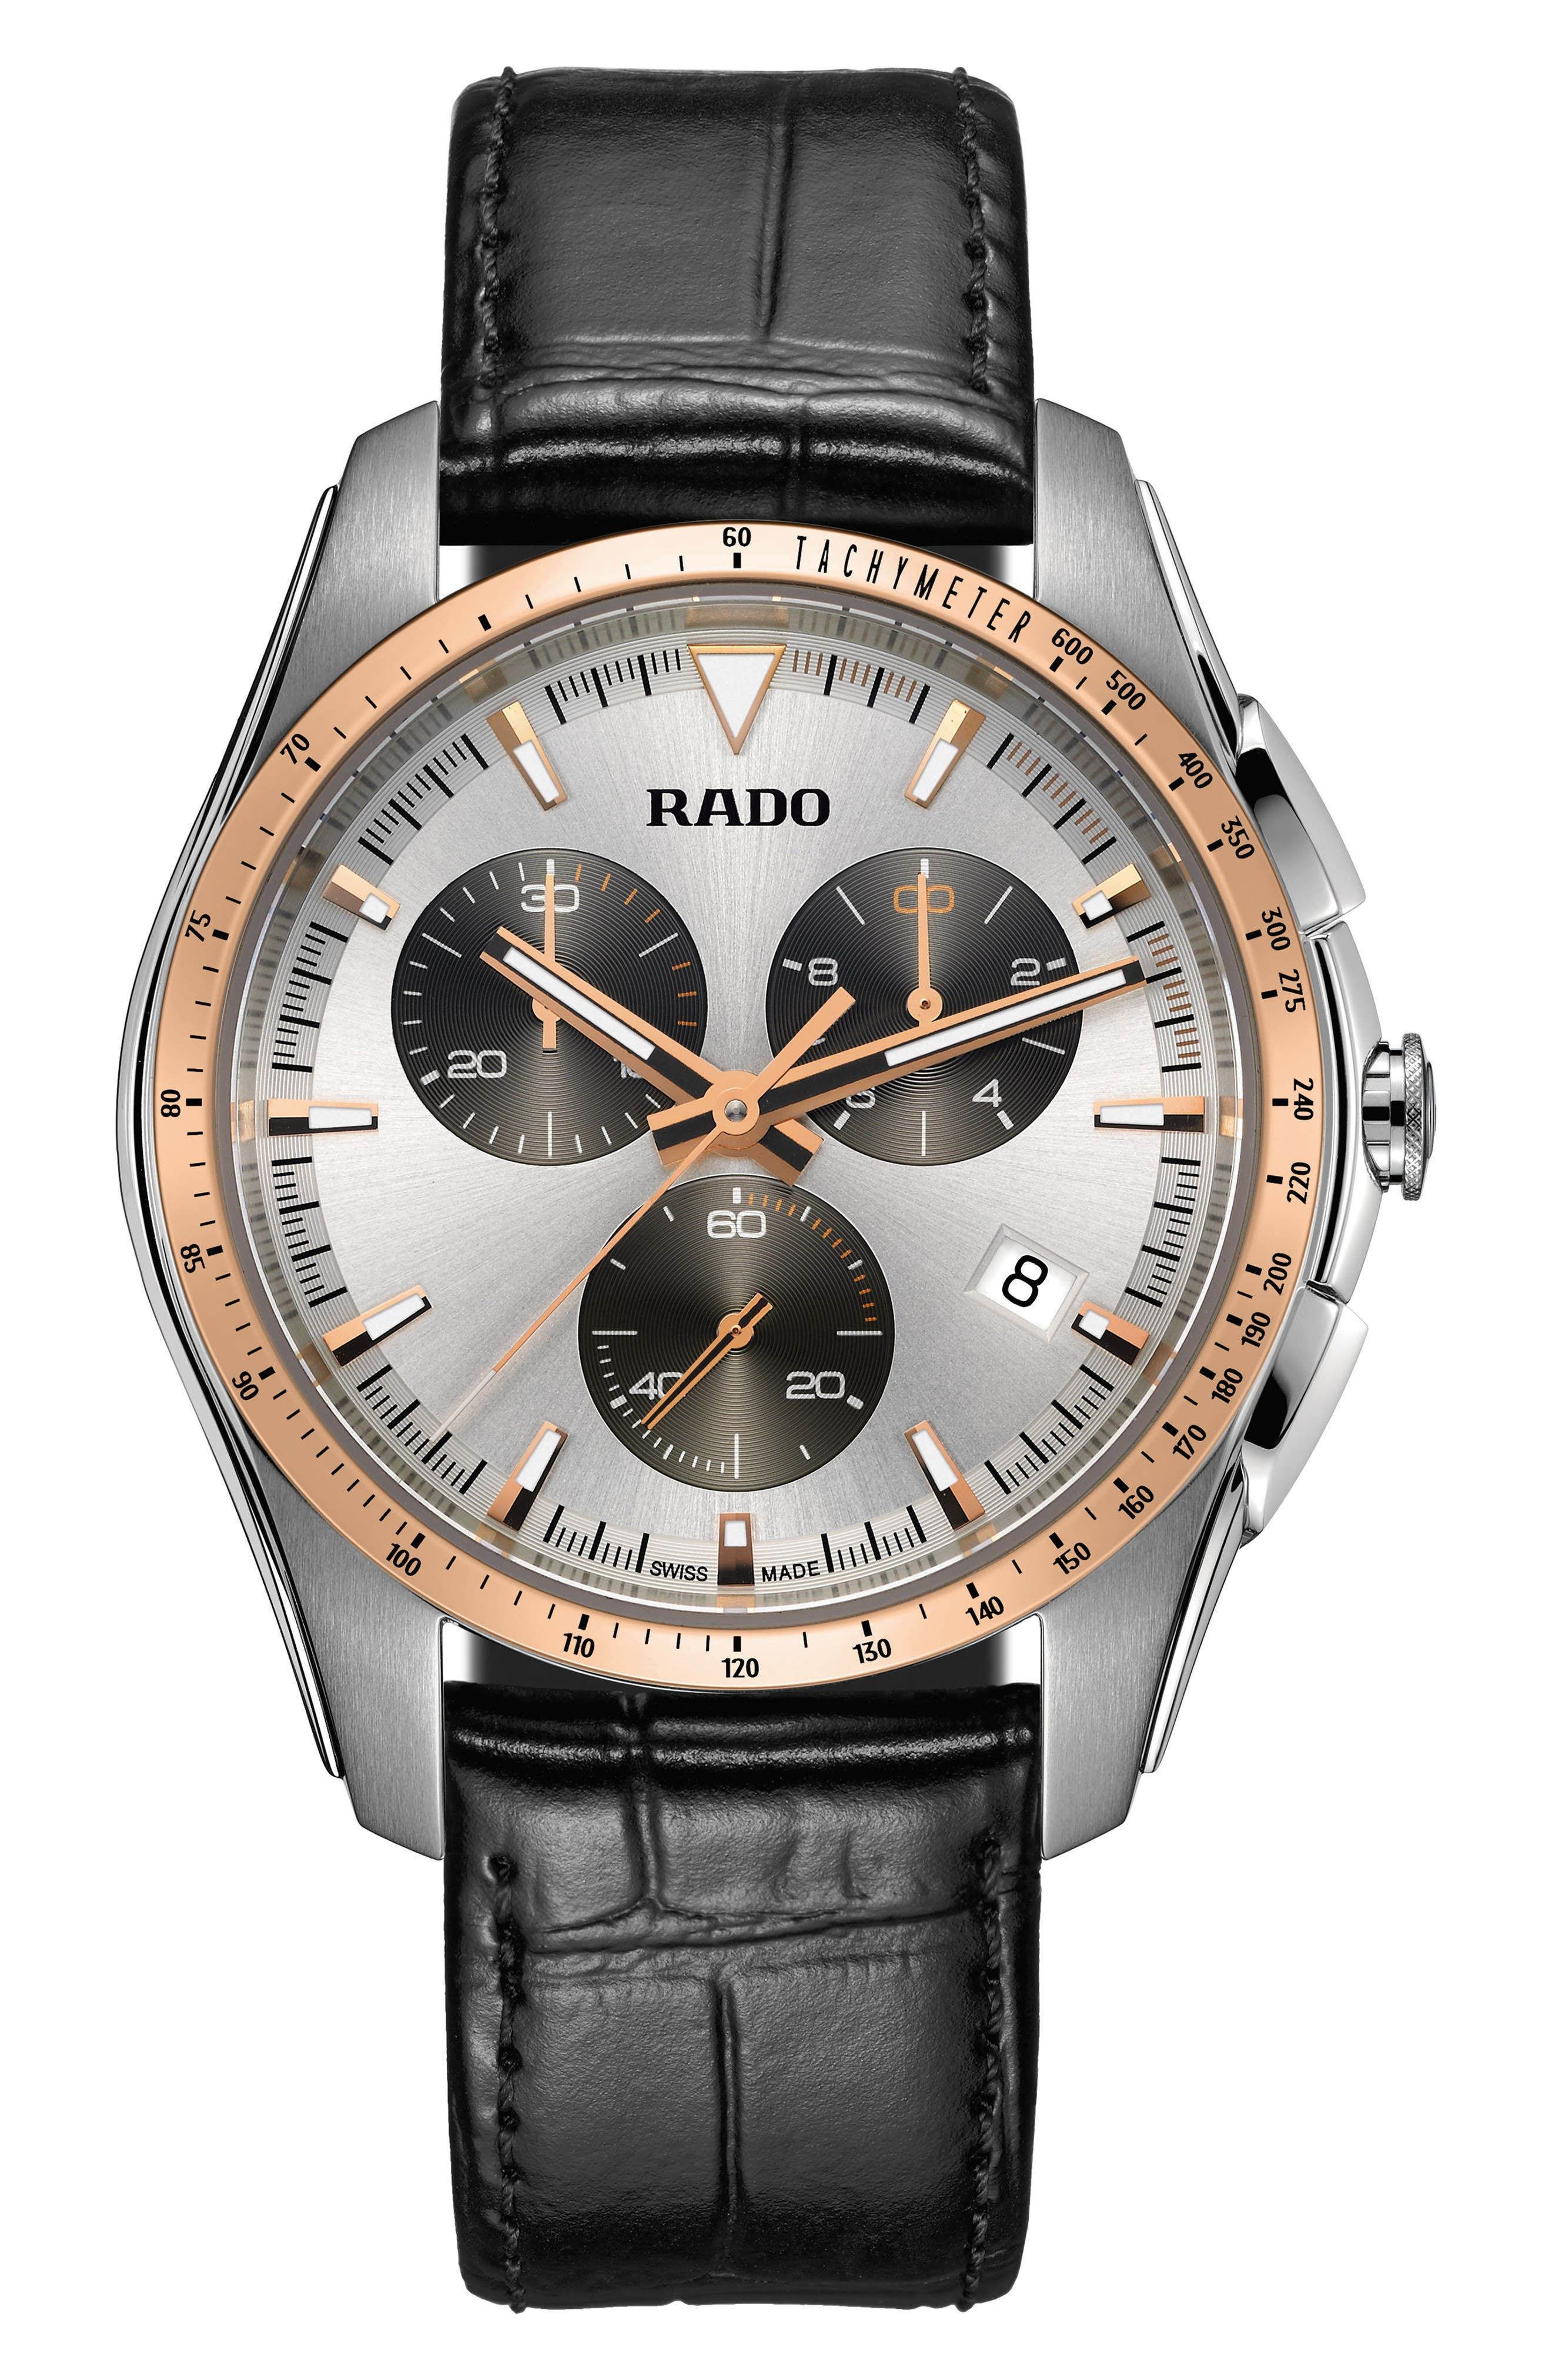 RADO HyperChrome Chronograph Leather Strap Watch, 44.9mm